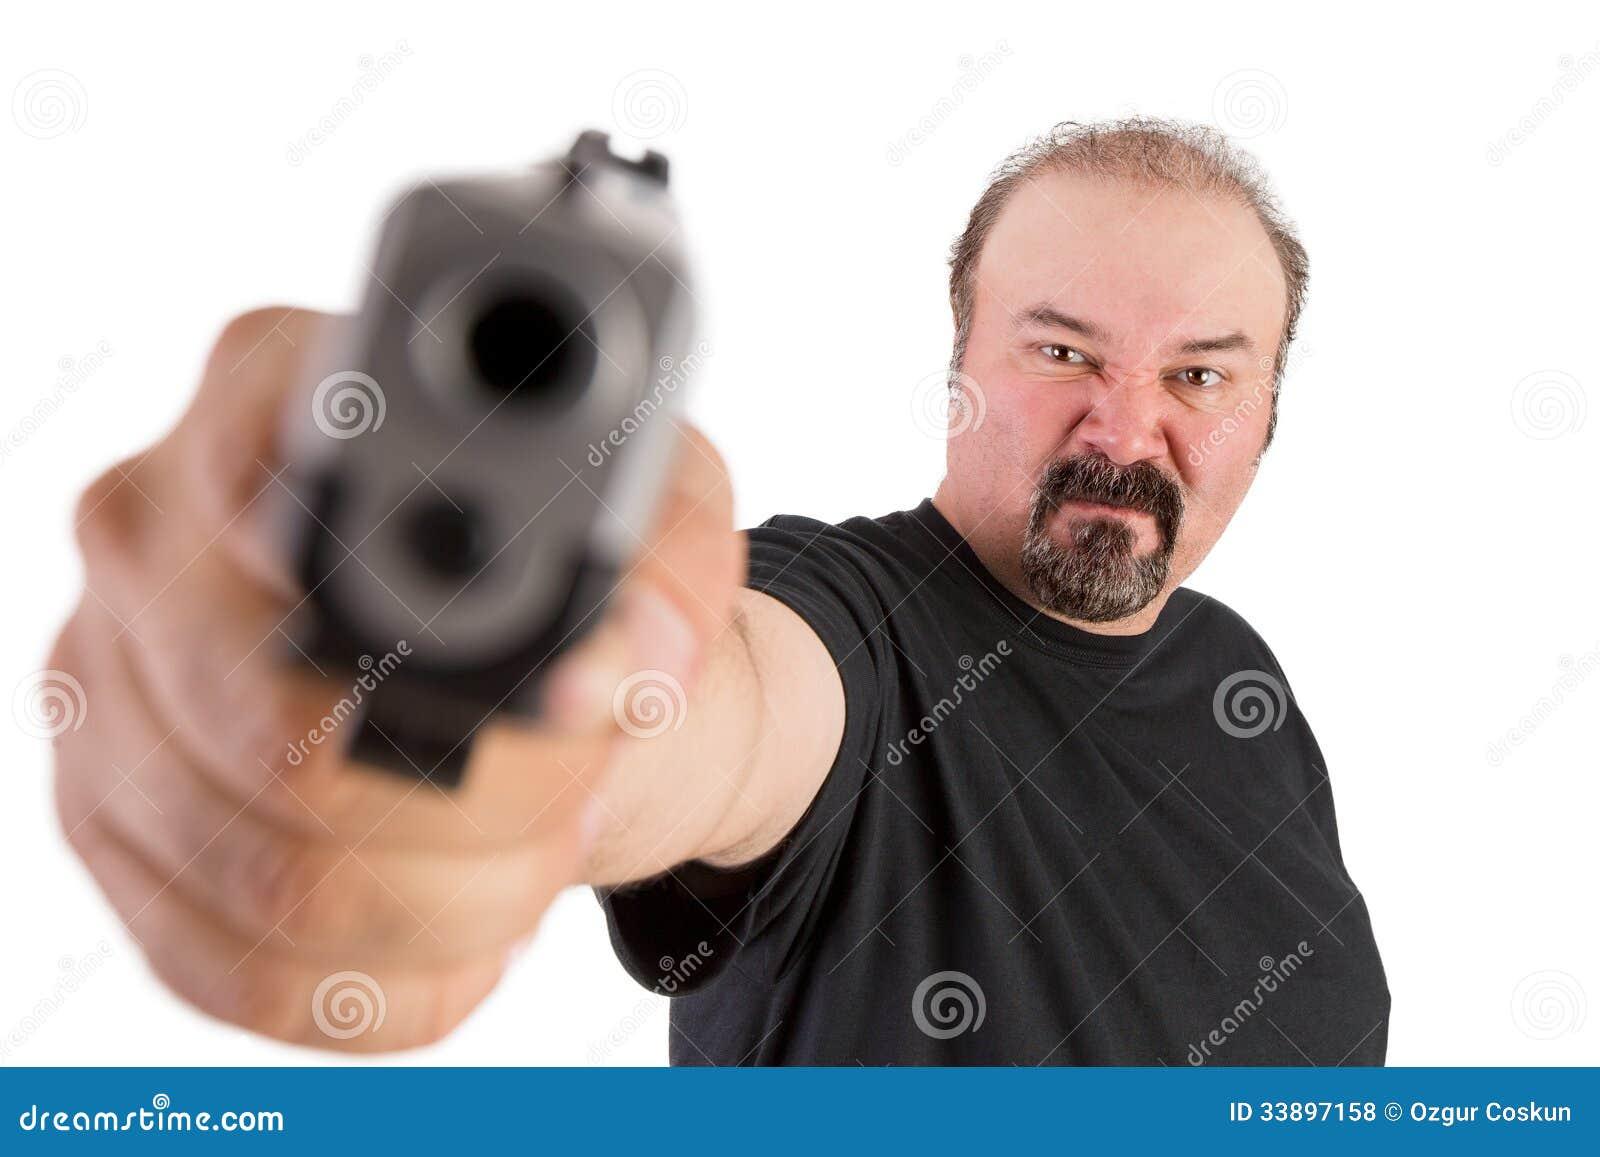 Gun Pointed At You Royalty Free Stock Photos Image 33897158